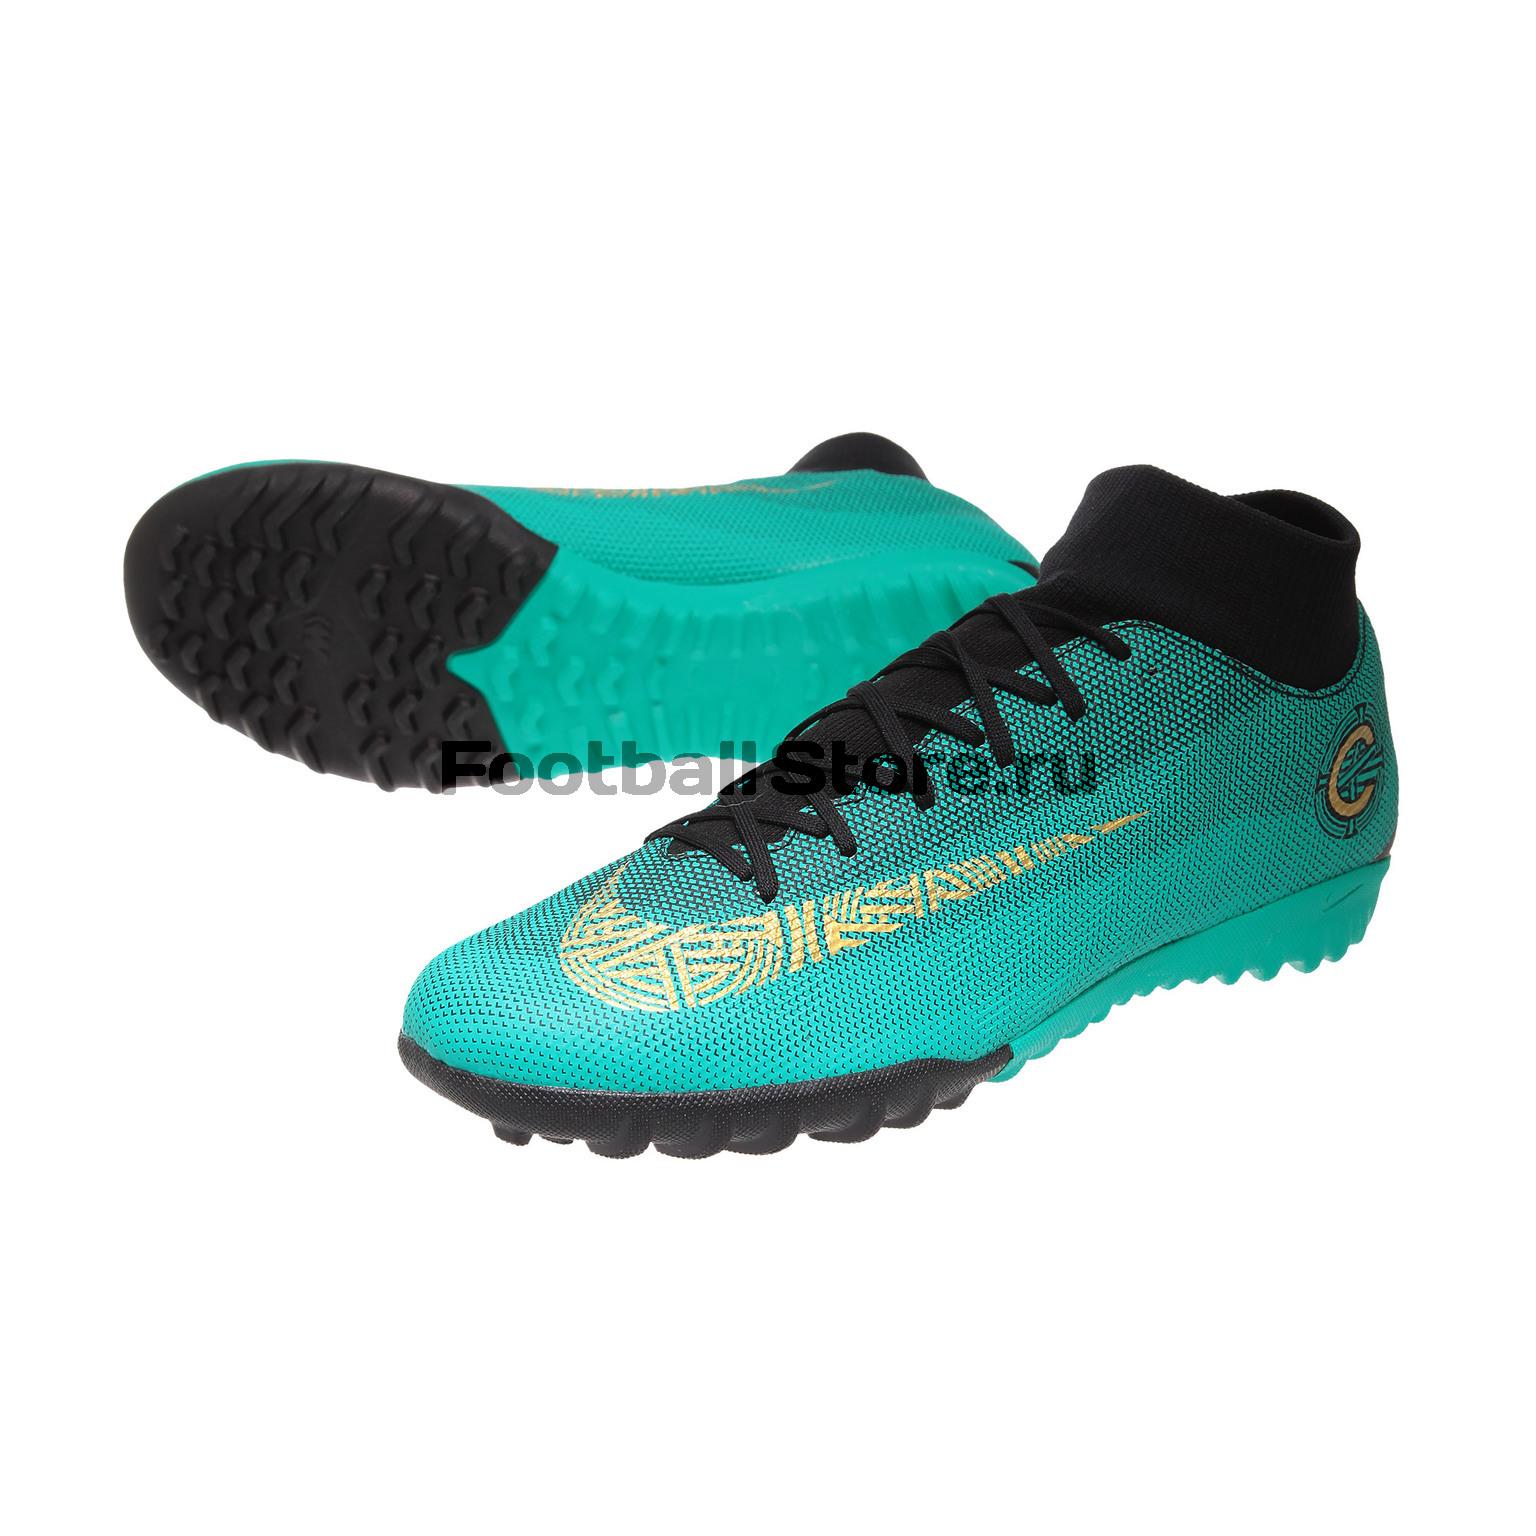 Шиповки Nike Superfly 6 Academy CR7 TF AJ3568-390 – купить шиповки в ... f1fe20c6bcd4